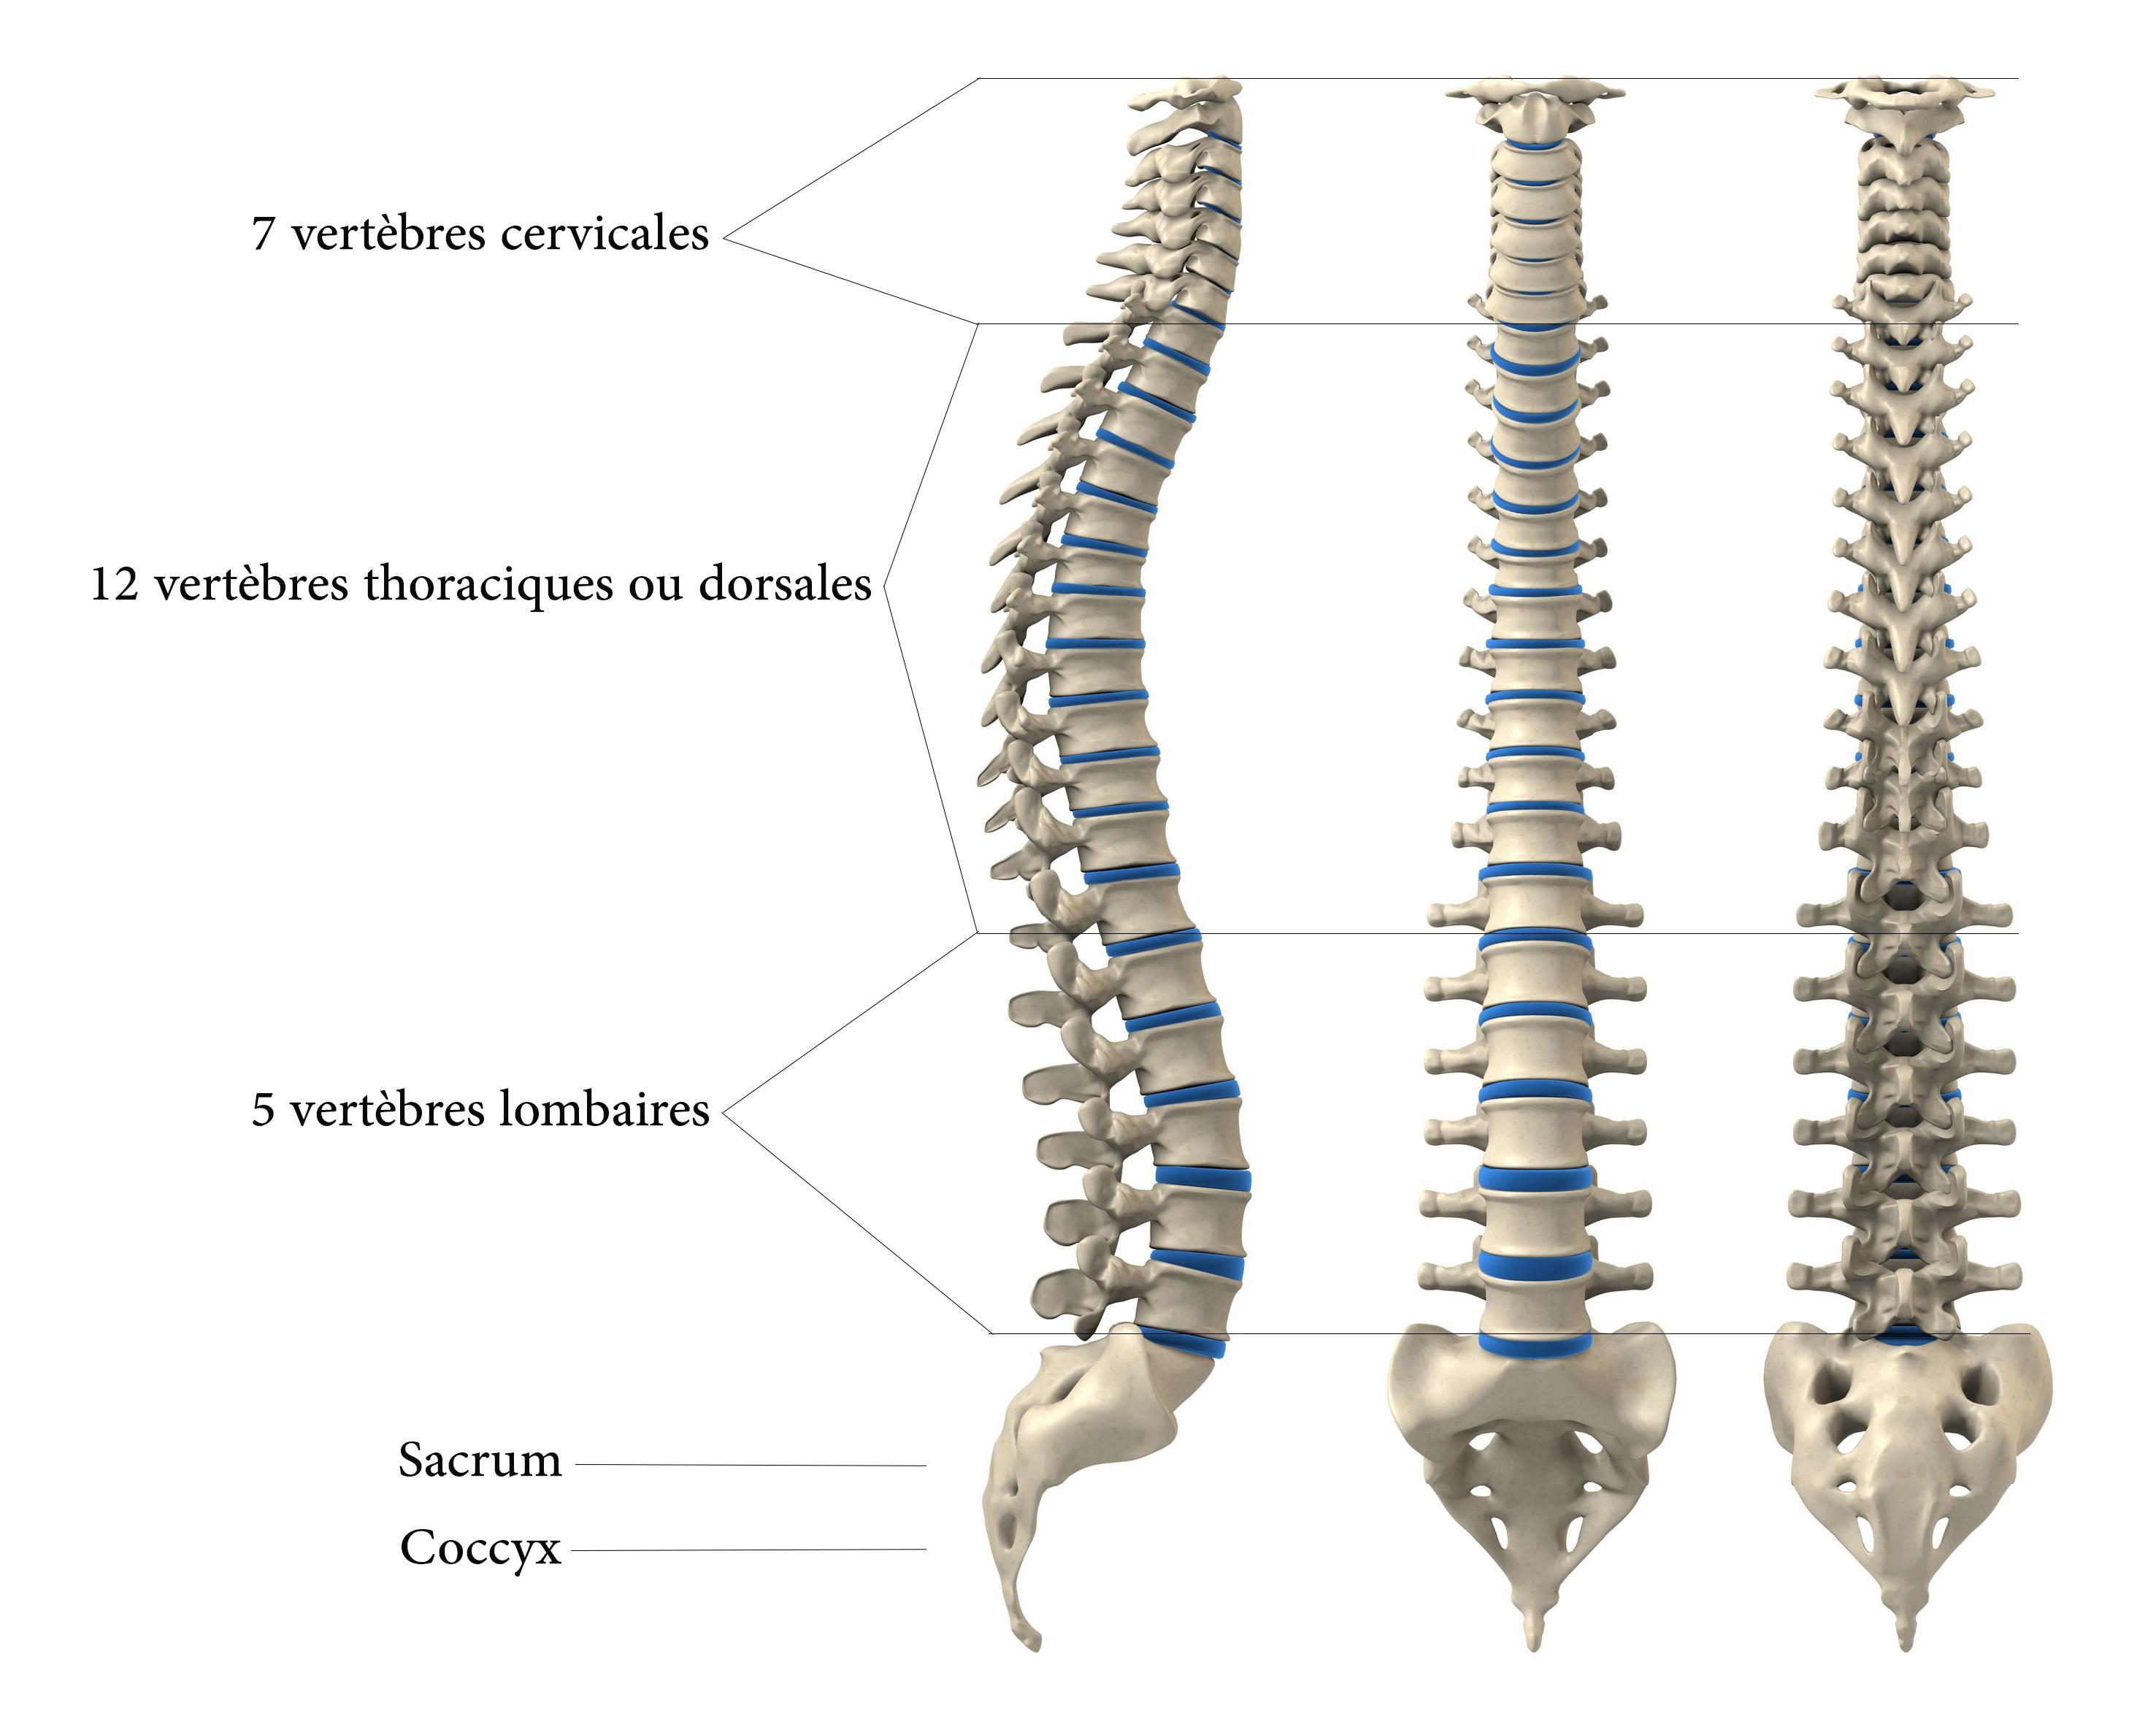 anatomie de la colone vertébrale